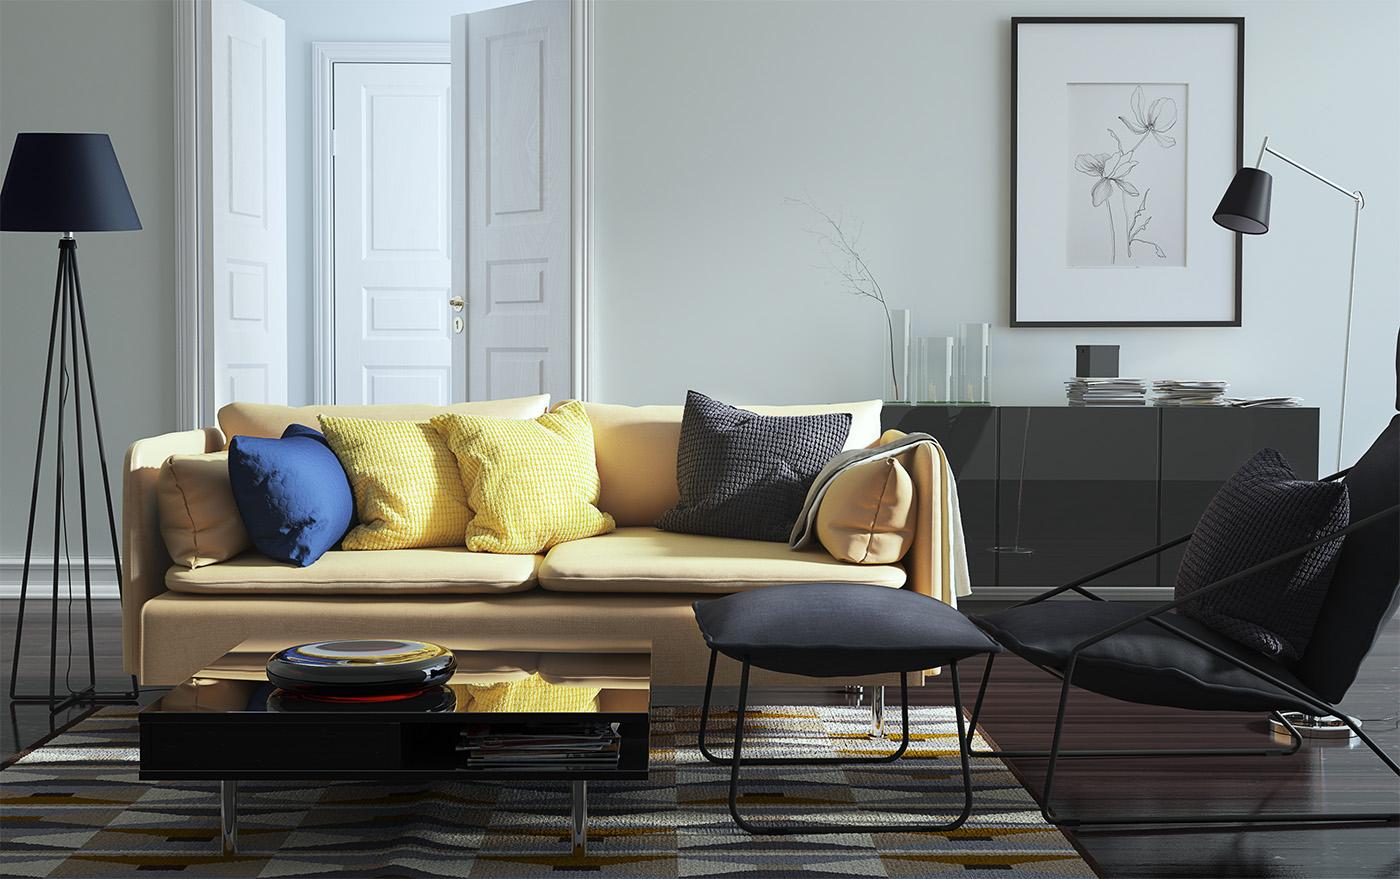 Interior Visualization 3D Visualization living room CGI